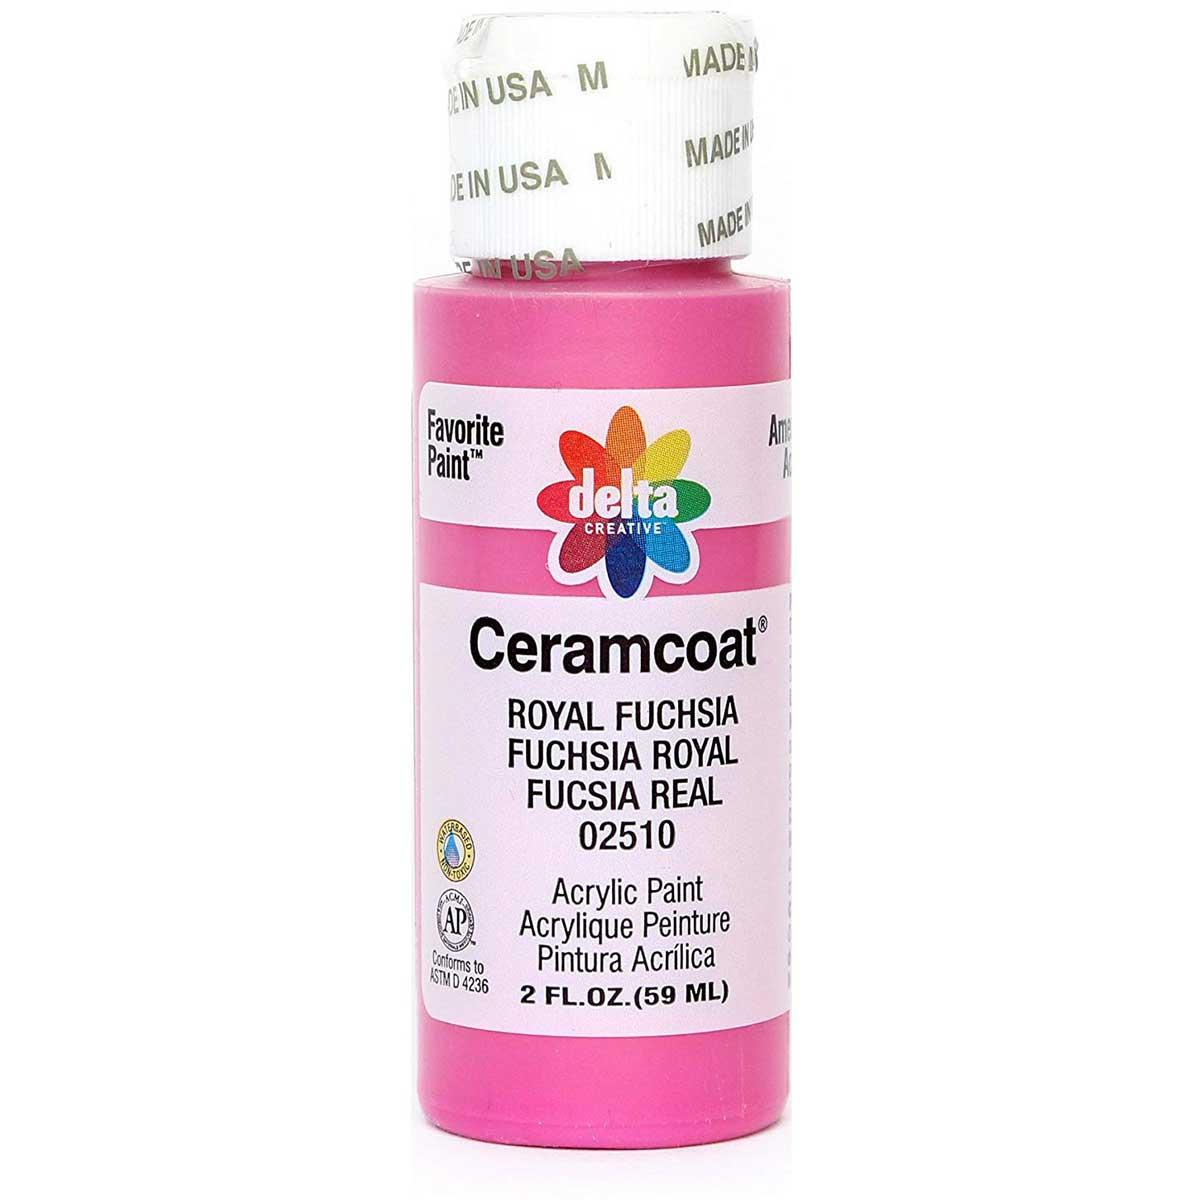 Delta Ceramcoat ® Acrylic Paint - Royal Fuchsia, 2 oz.